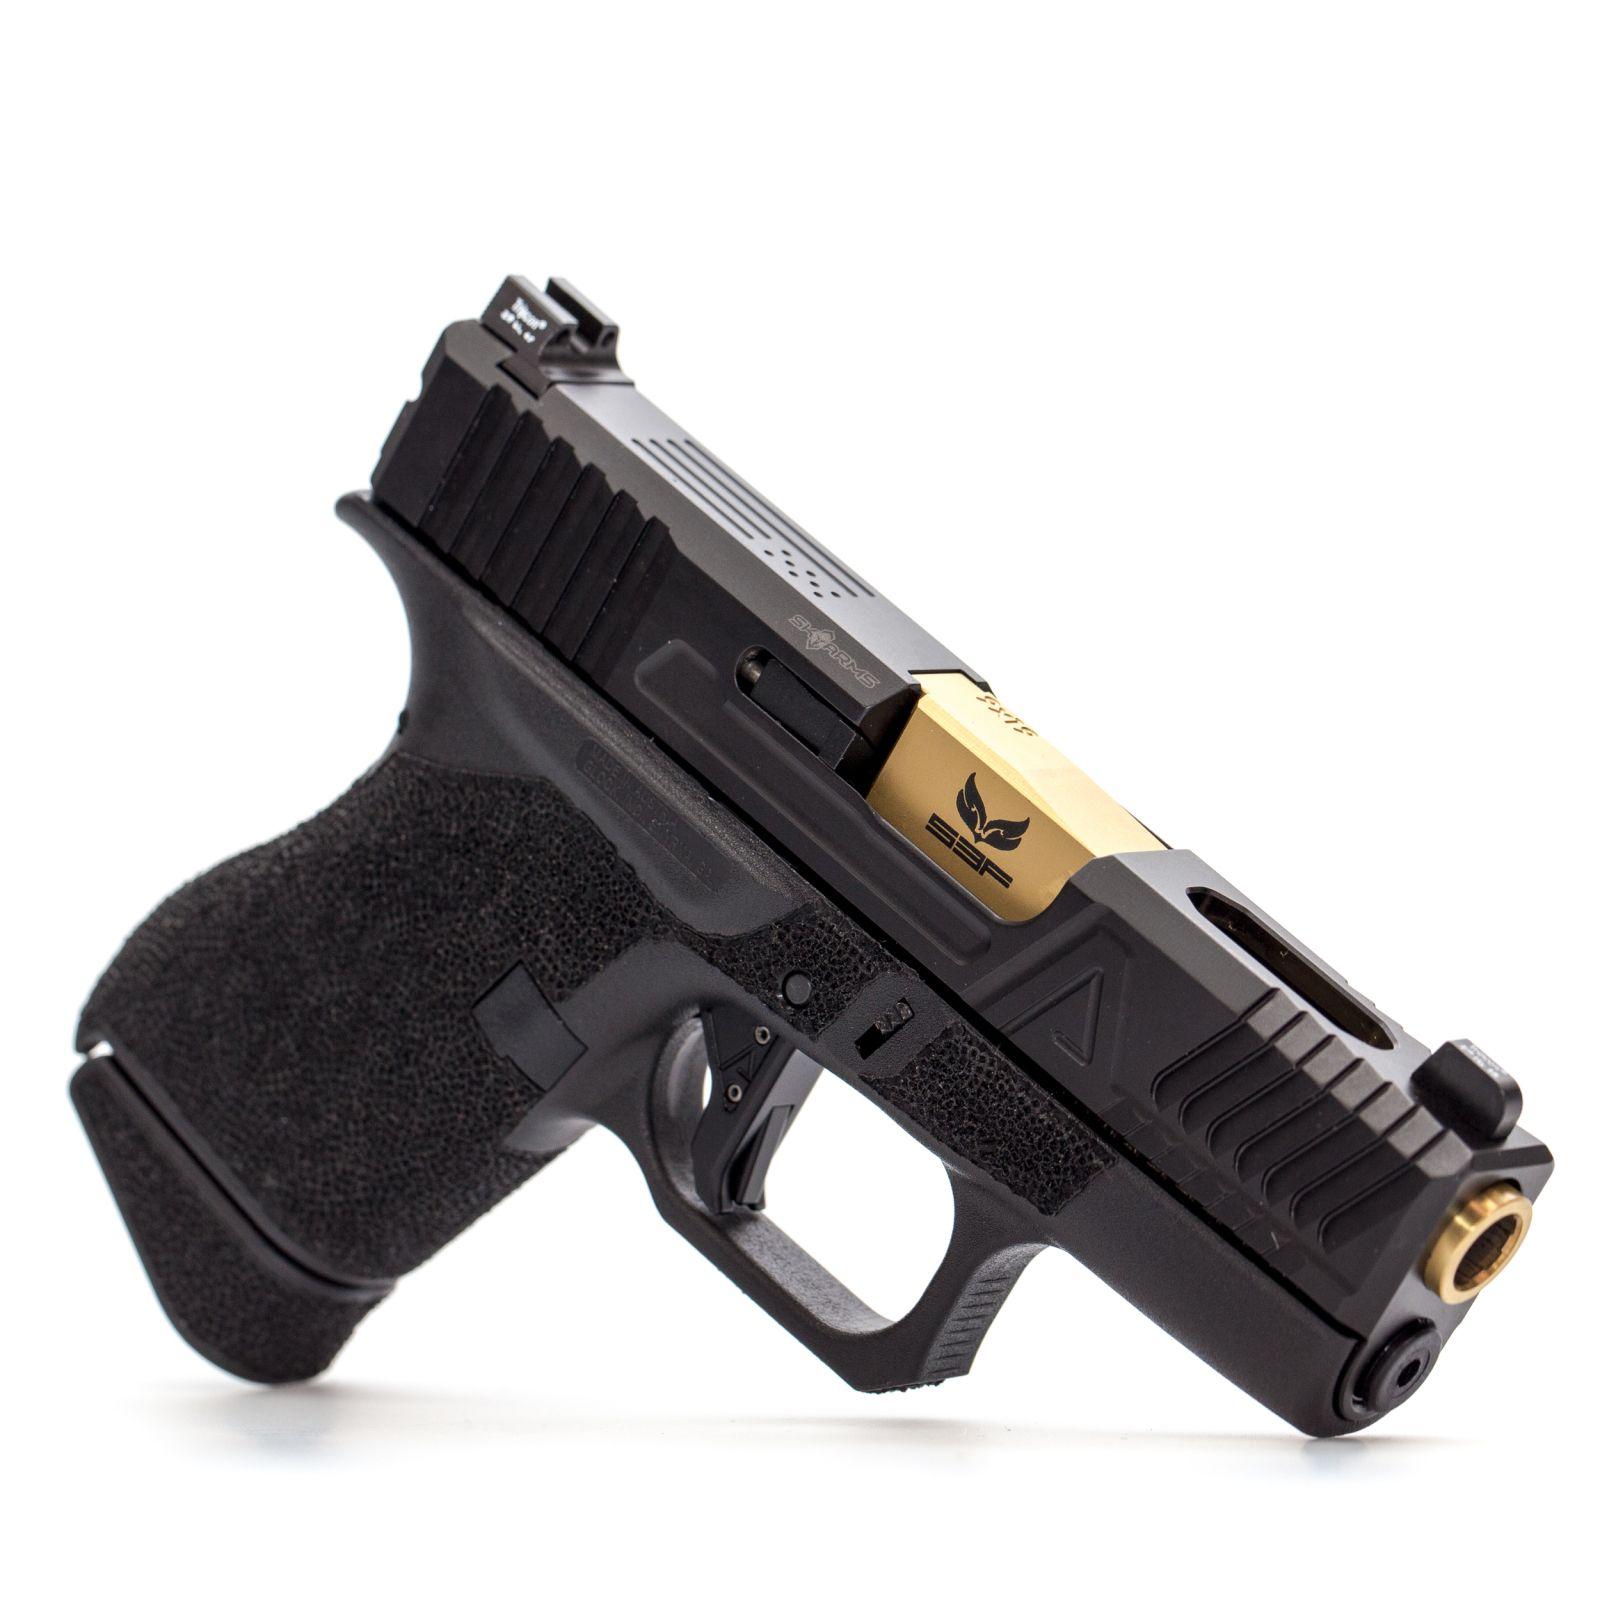 Pin by Hunting on Hunting Knives   Guns, Hand guns, Custom ...